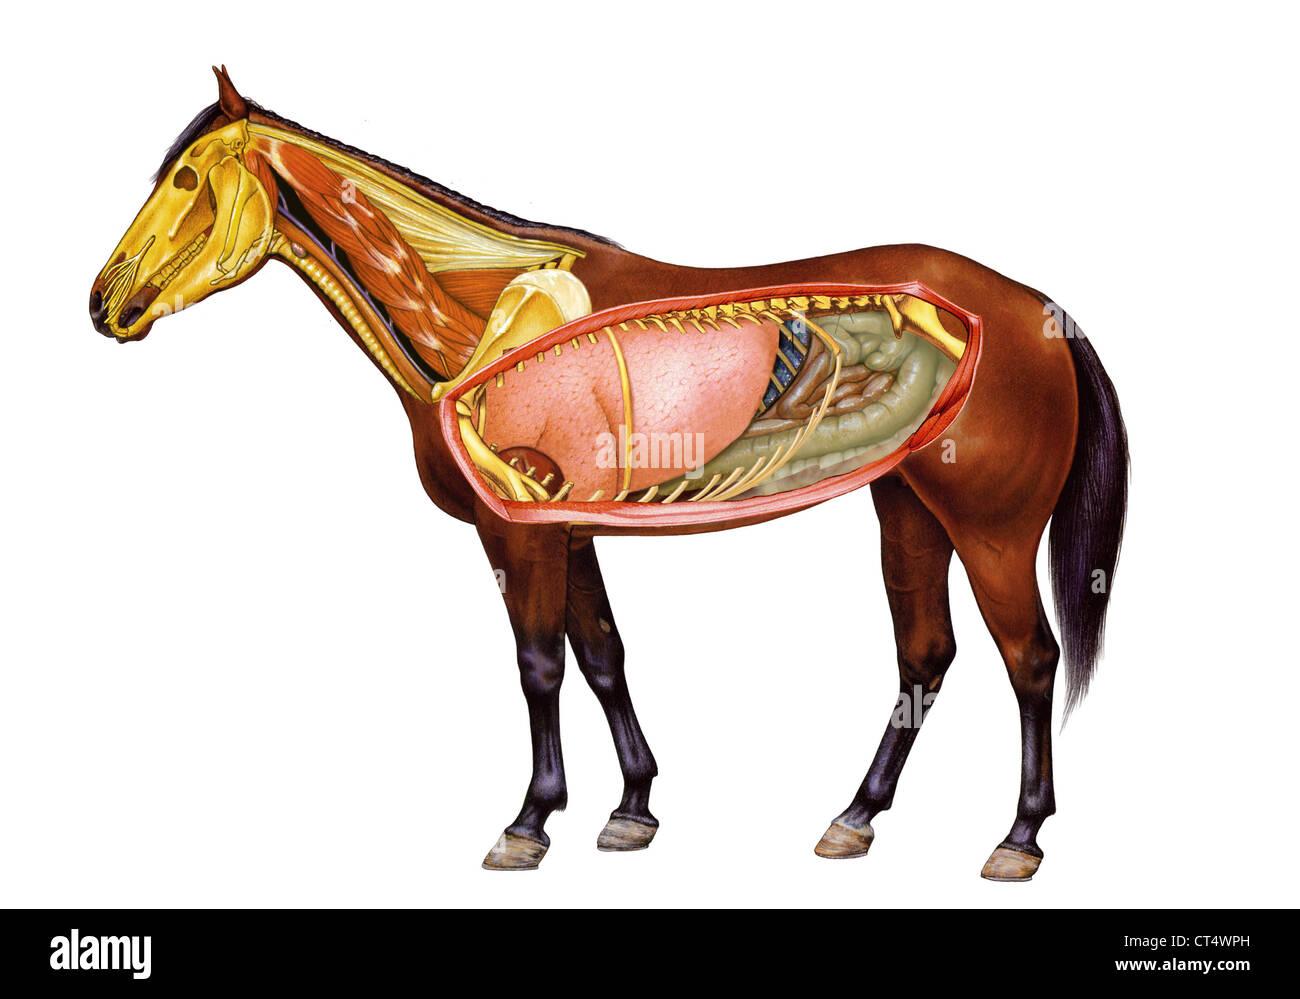 HORSE ANATOMY, DRAWING Stock Photo: 49280521 - Alamy